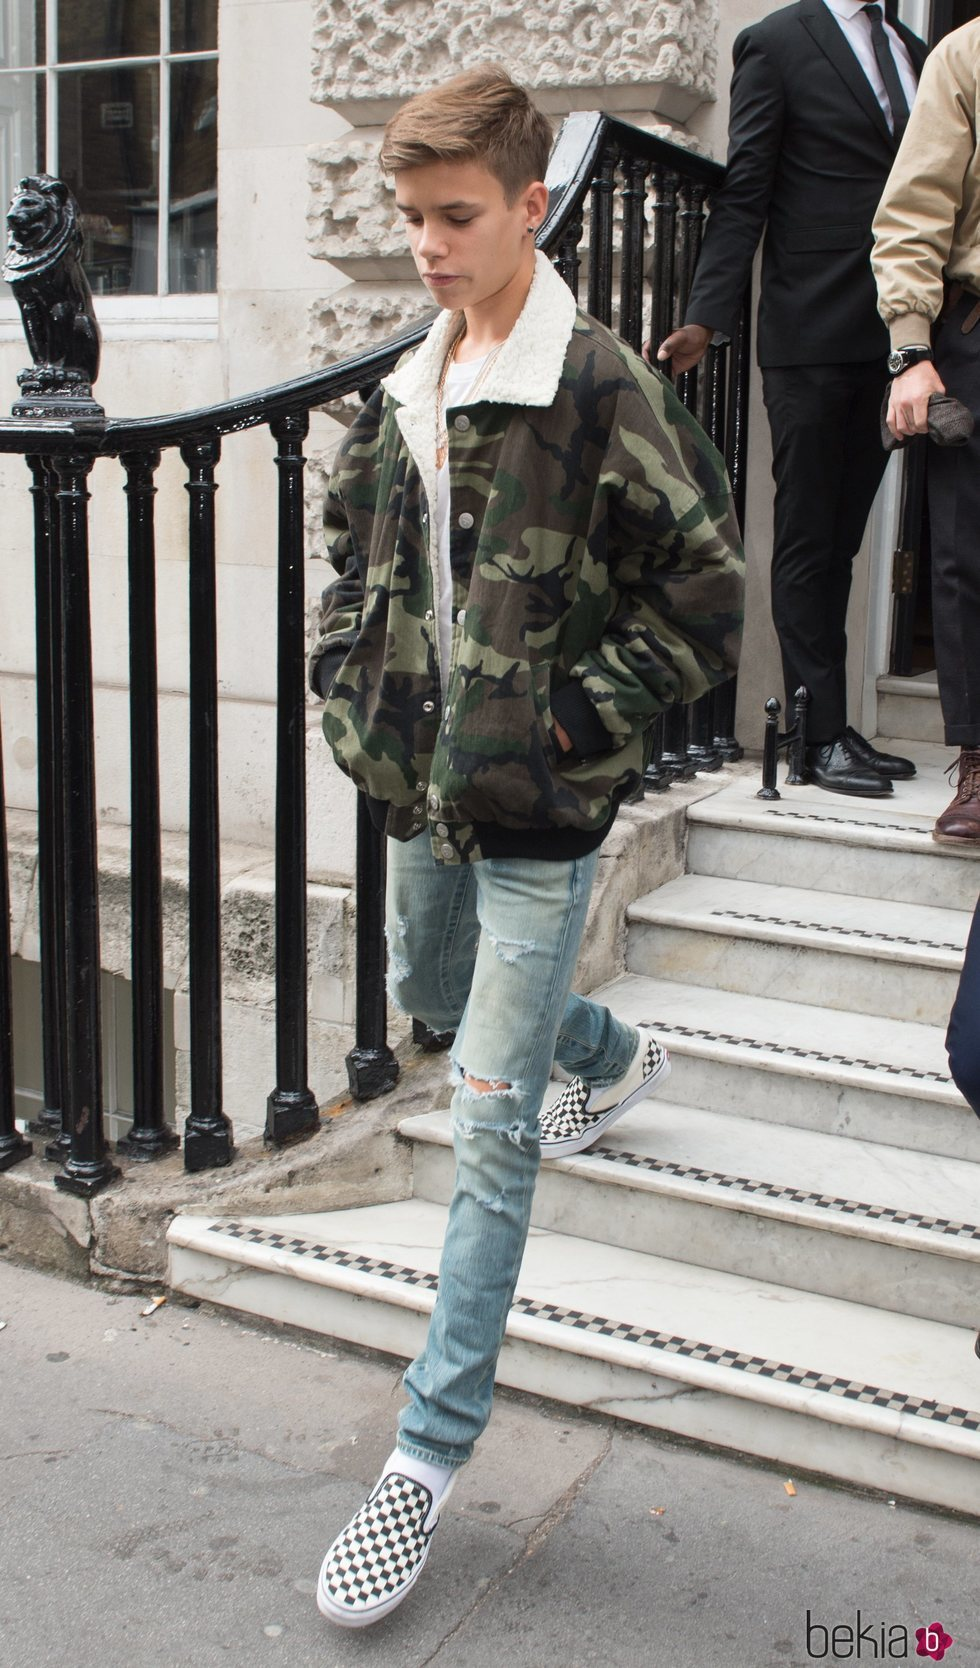 Romeo Beckham en el desfile de Victoria Beckham en la London Fashion Week